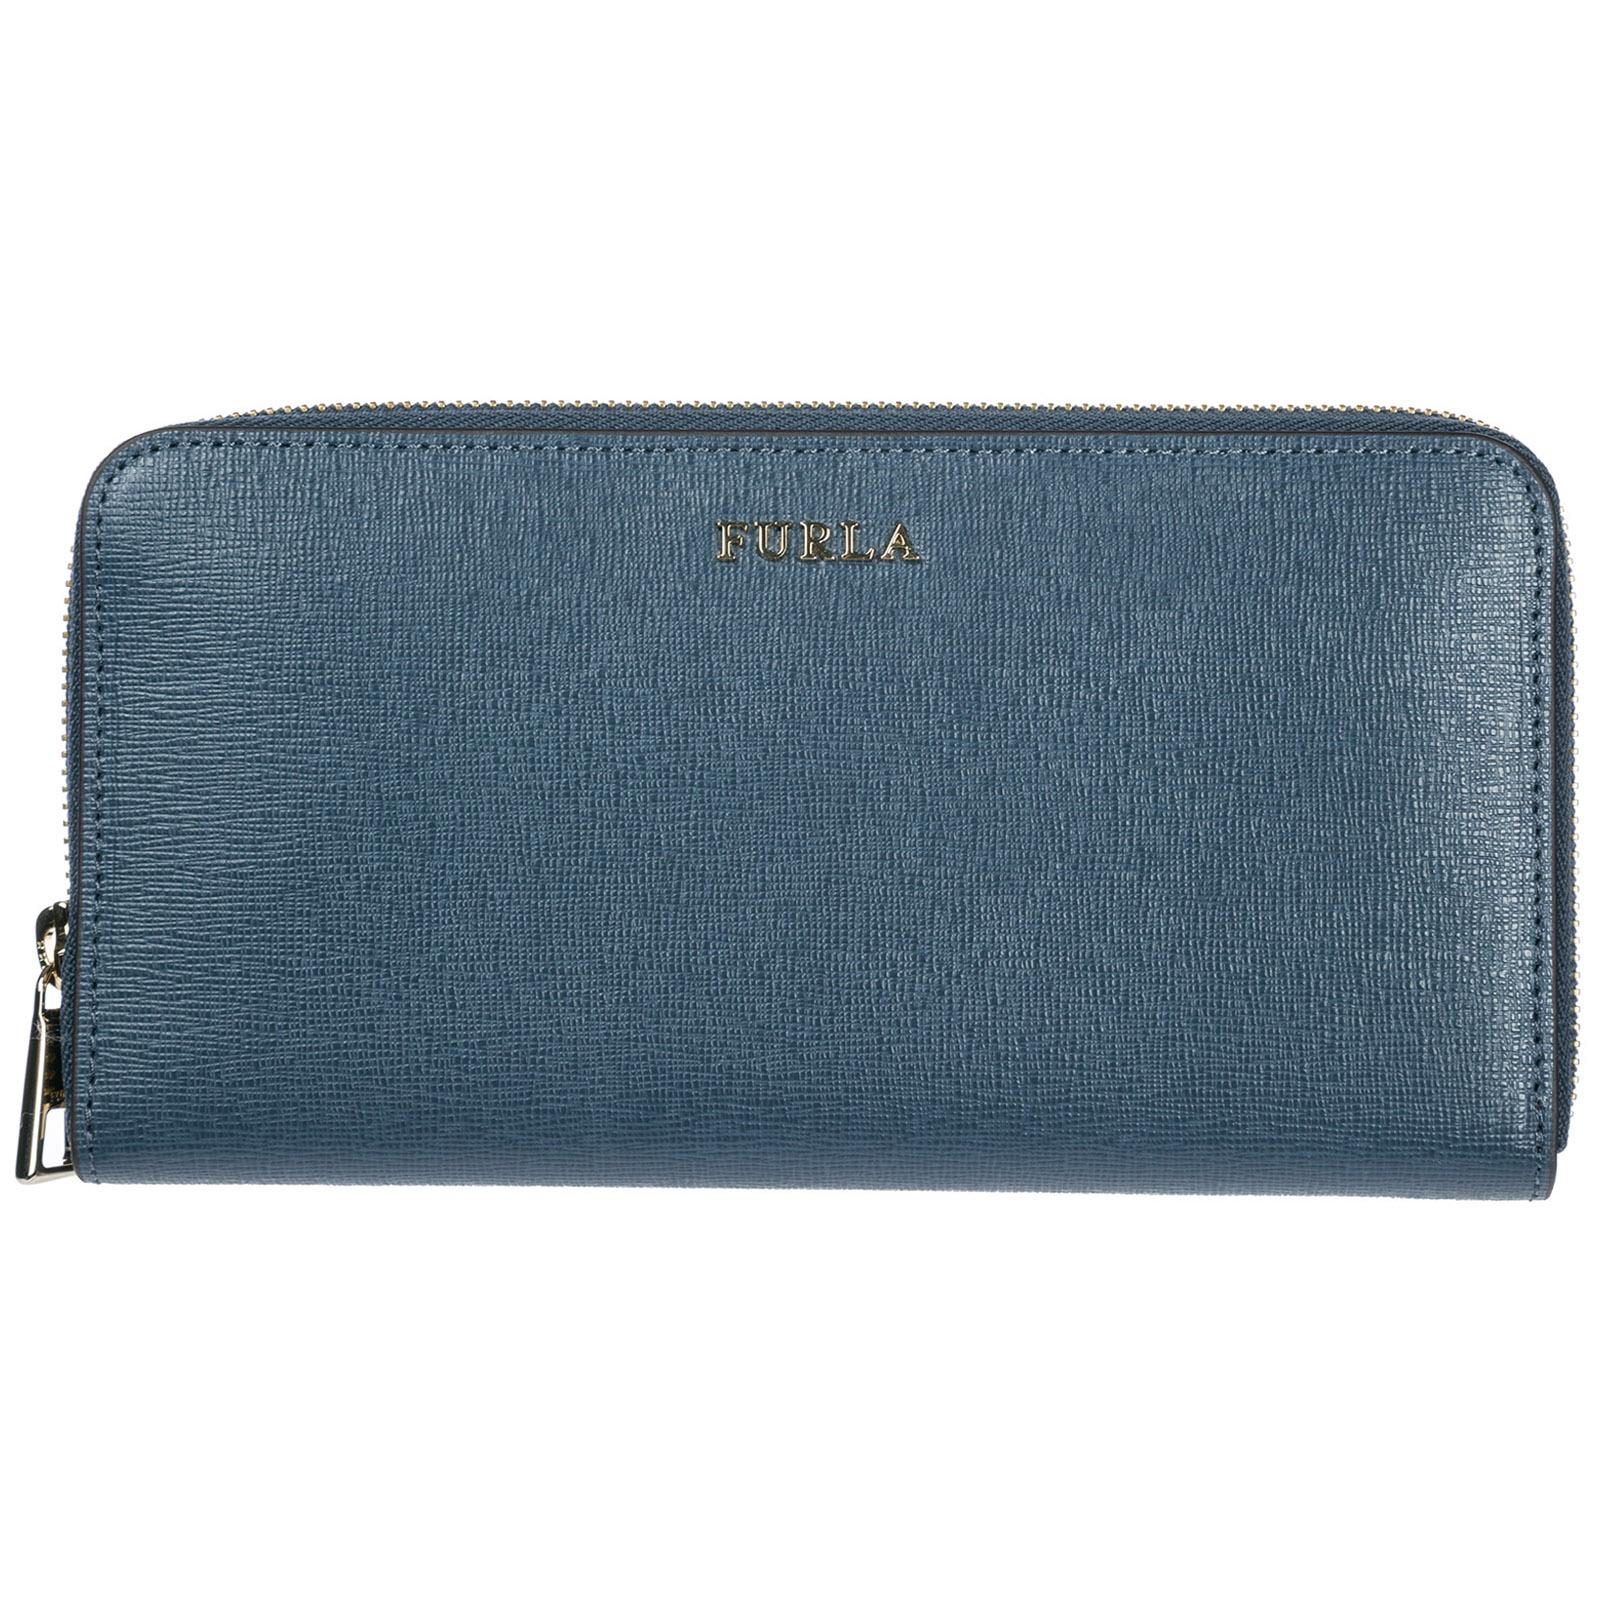 Wallet furla 887329 avio scuro frmoda womens wallet genuine leather coin case holder purse card bifold babylon reheart Gallery